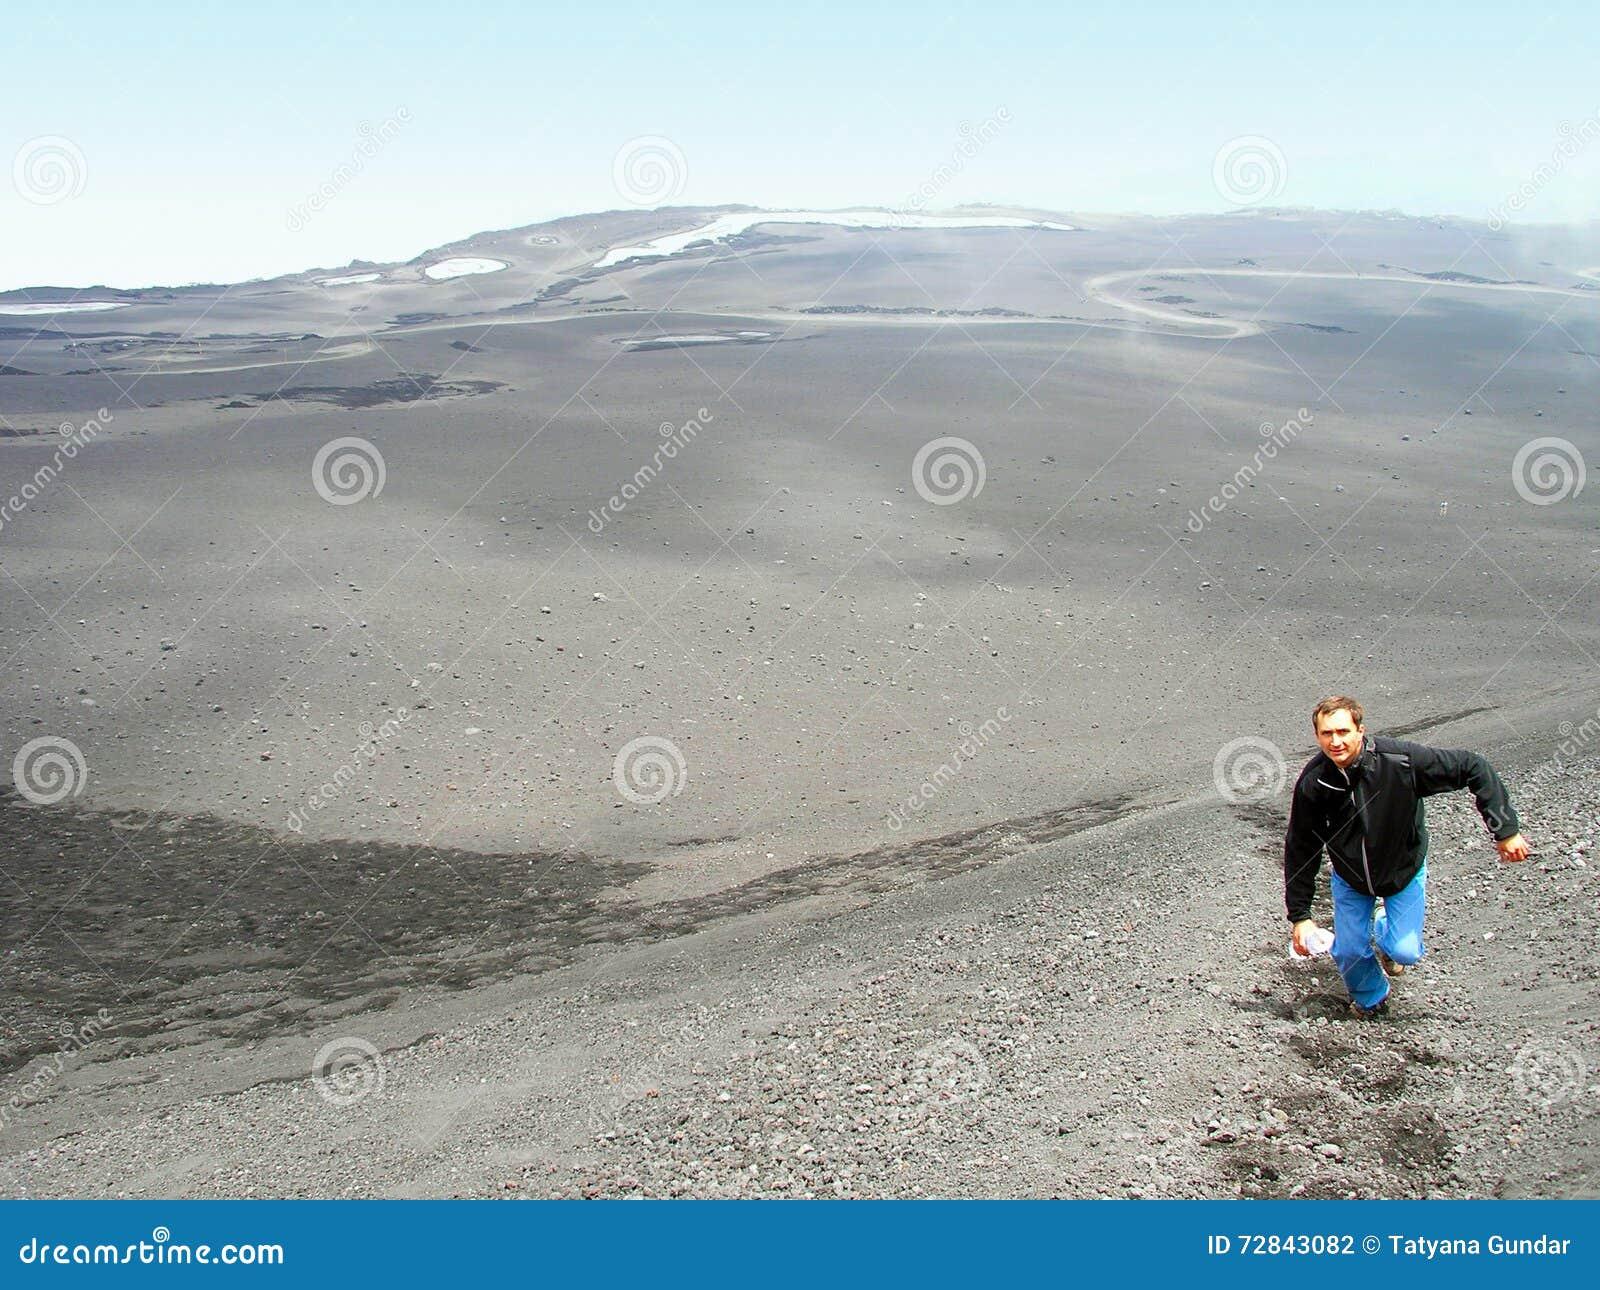 Climbing to top Mount Etna.